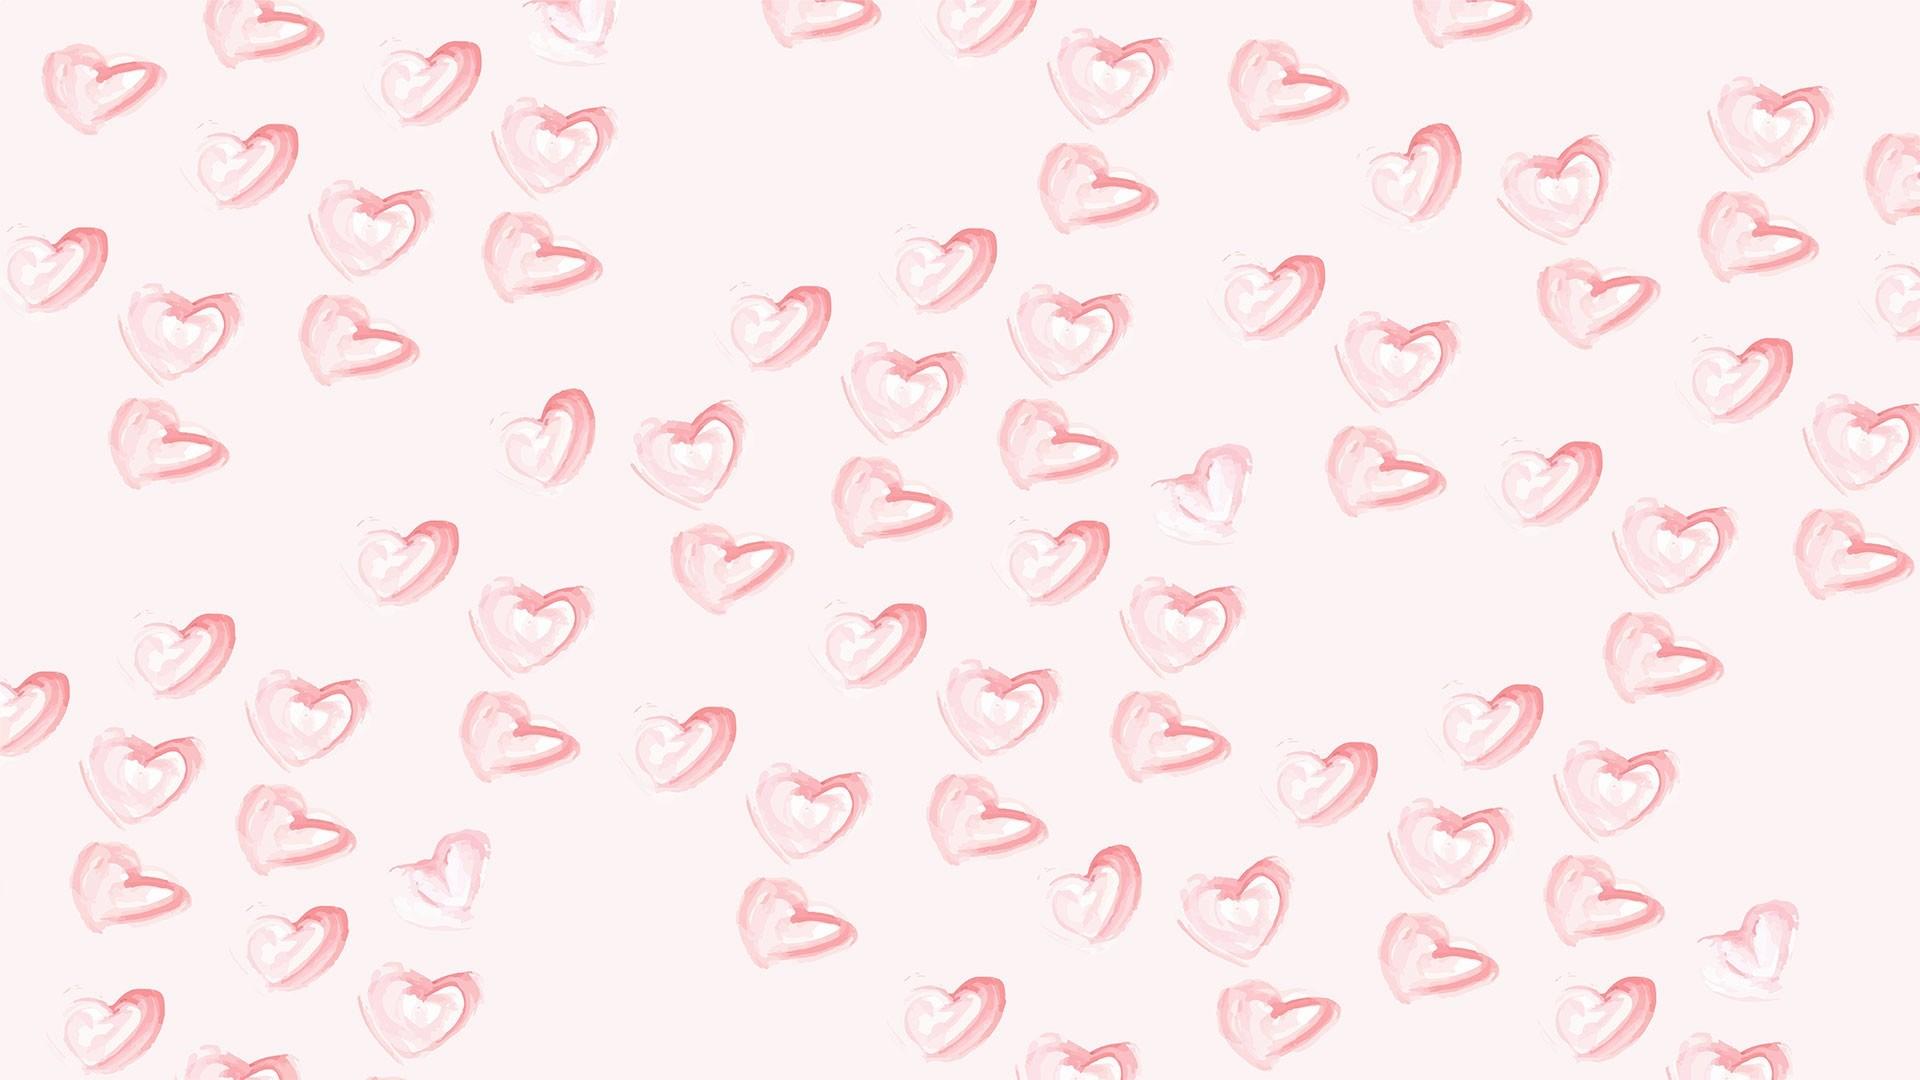 Heart Aesthetic Wallpaper image hd